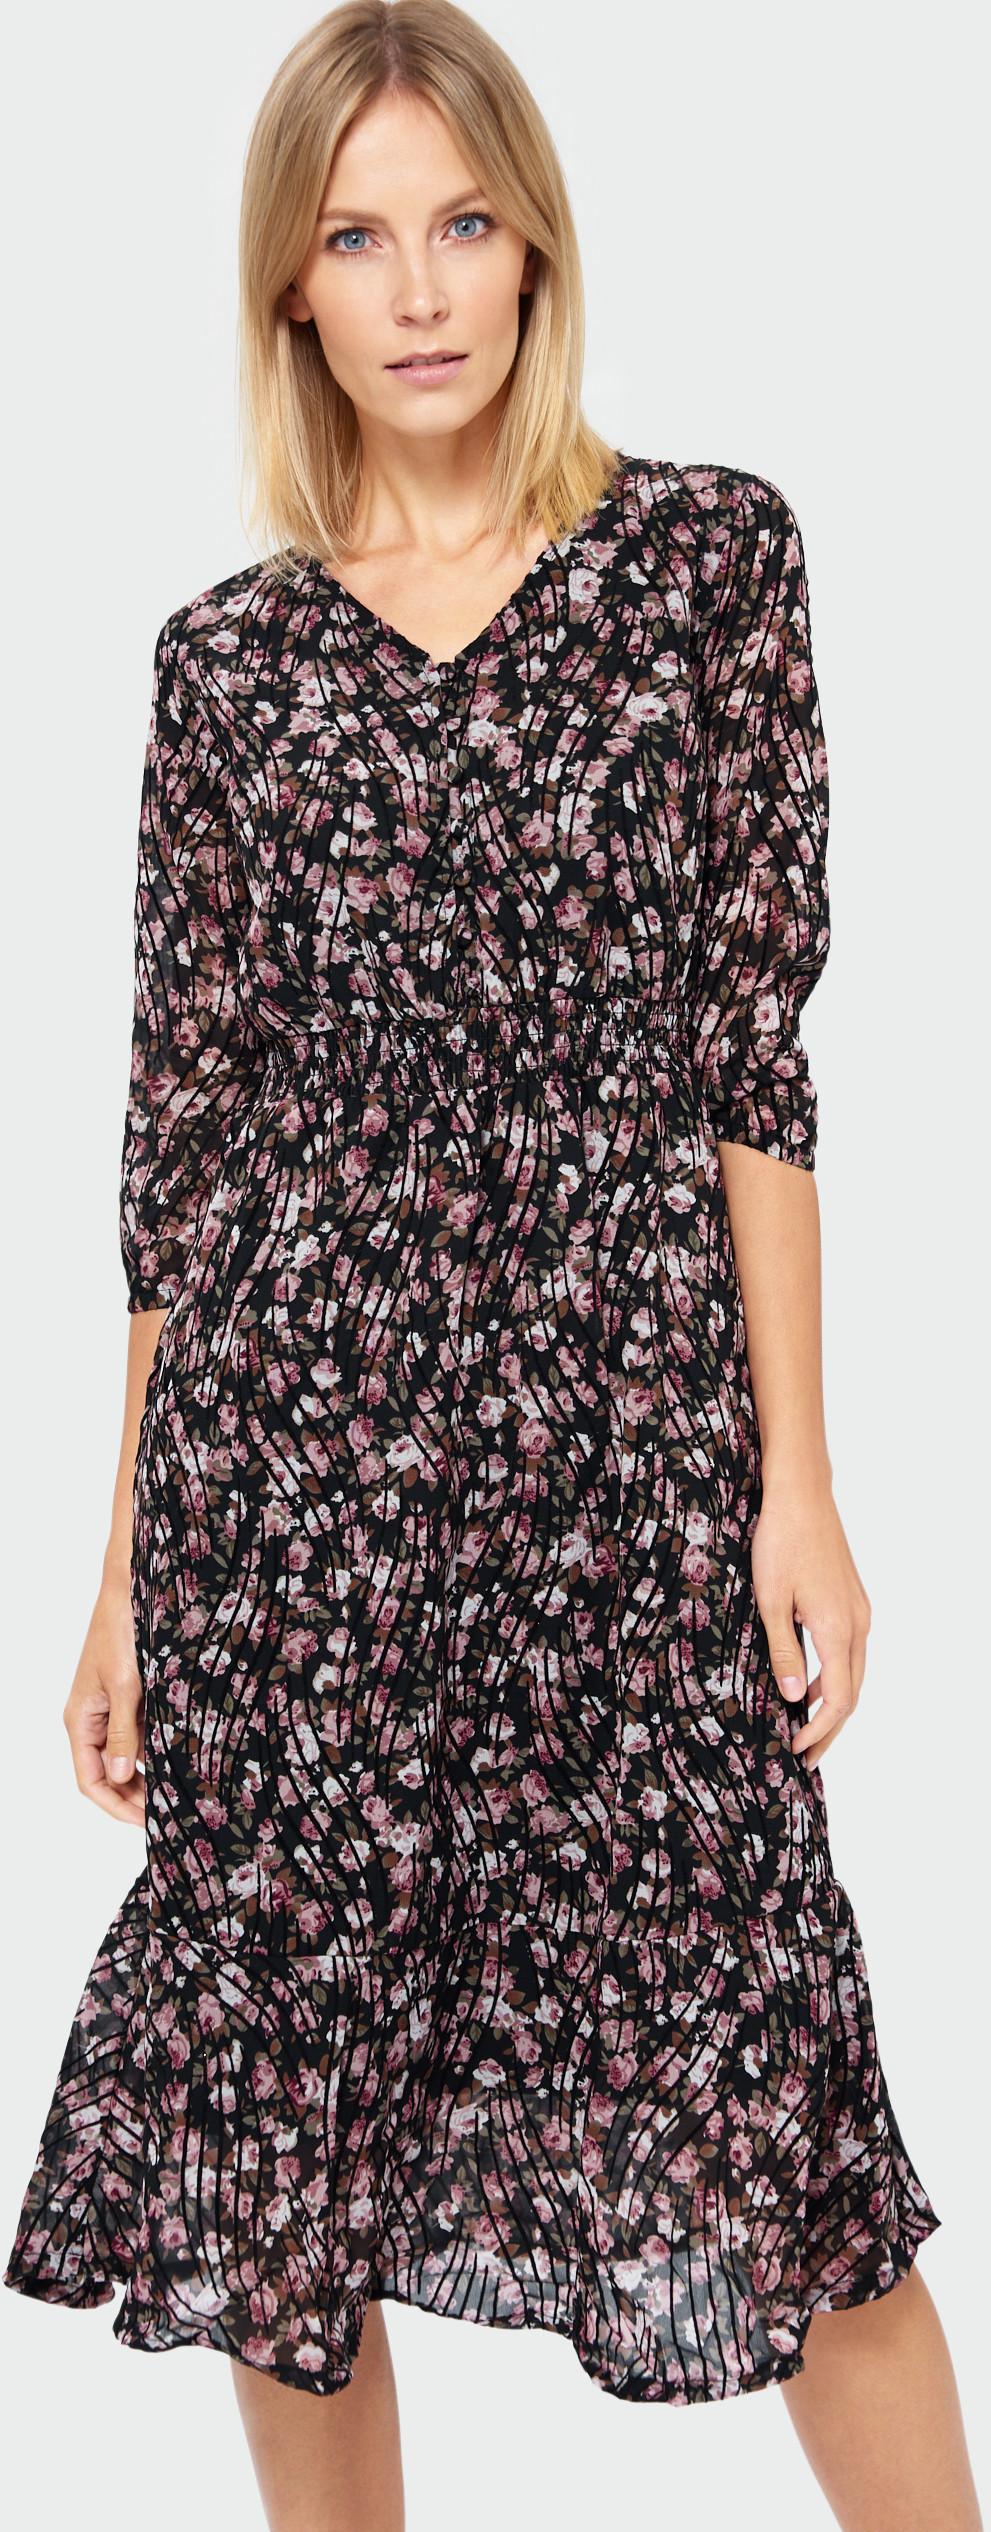 Elegancka sukienka z nadrukiem SUK569W19FLW43